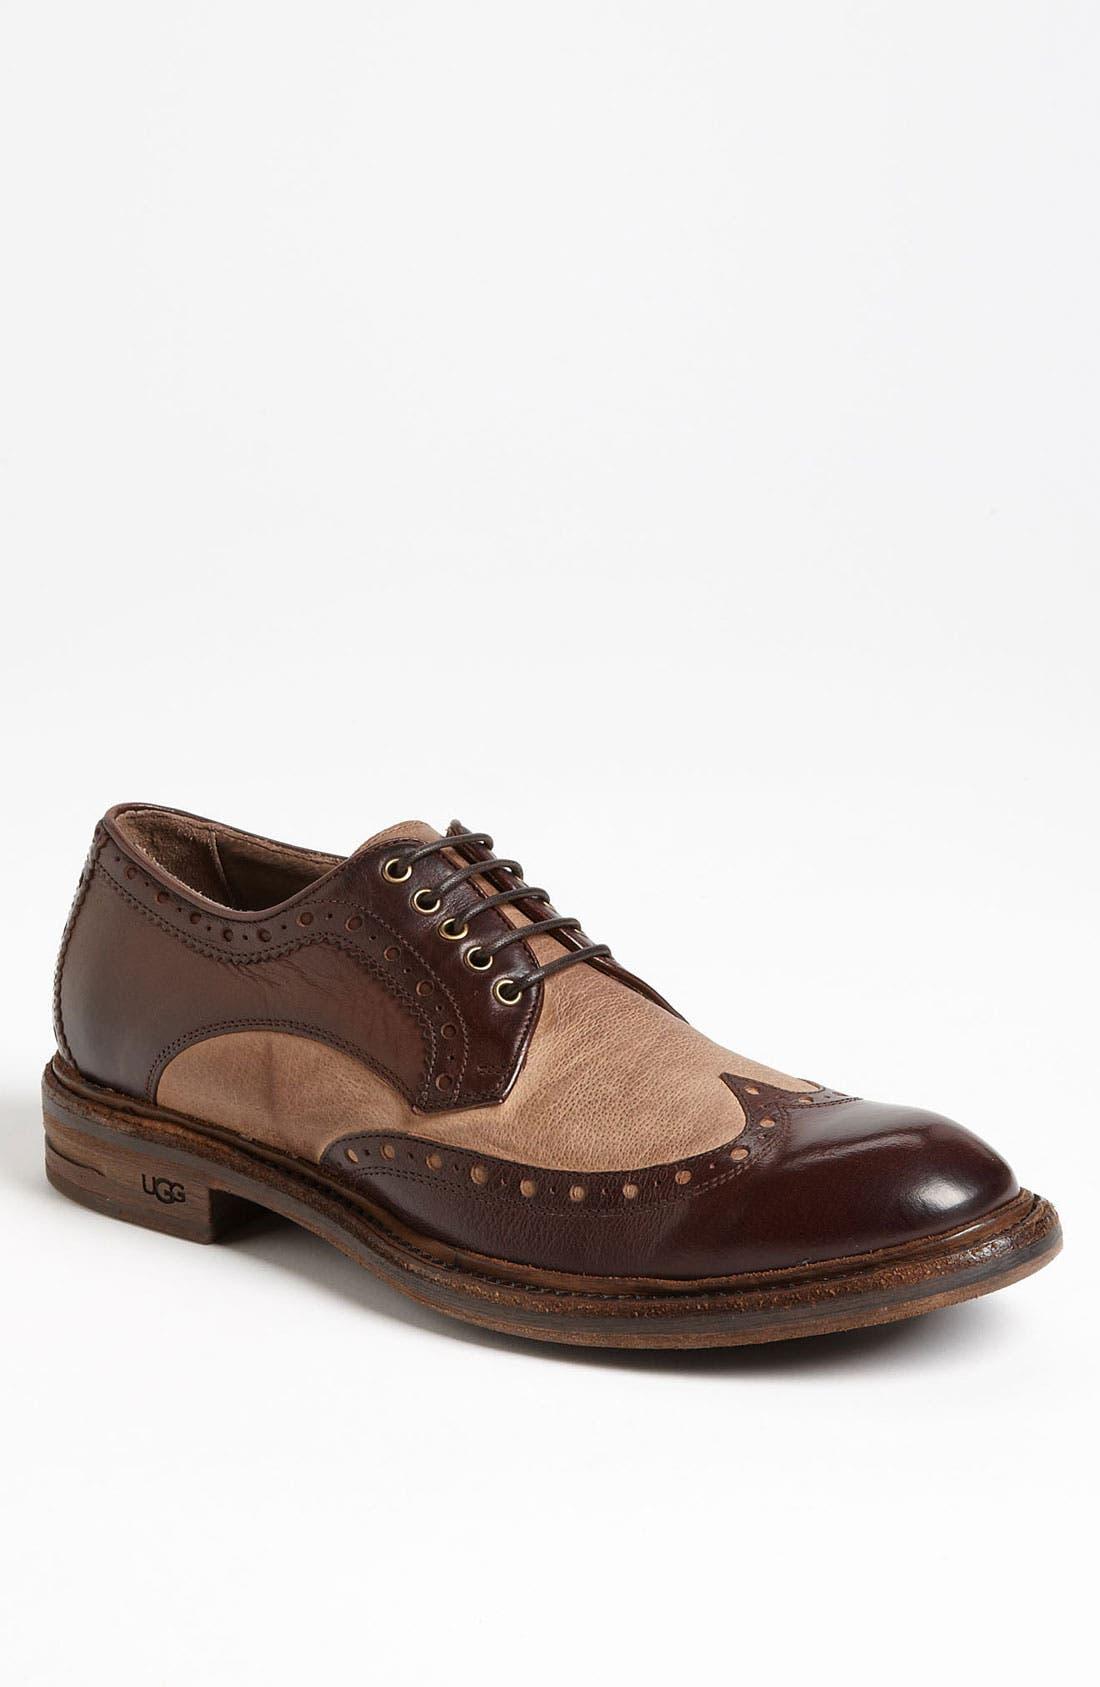 Alternate Image 1 Selected - UGG® Collection 'Allcott' Spectator Shoe (Men)